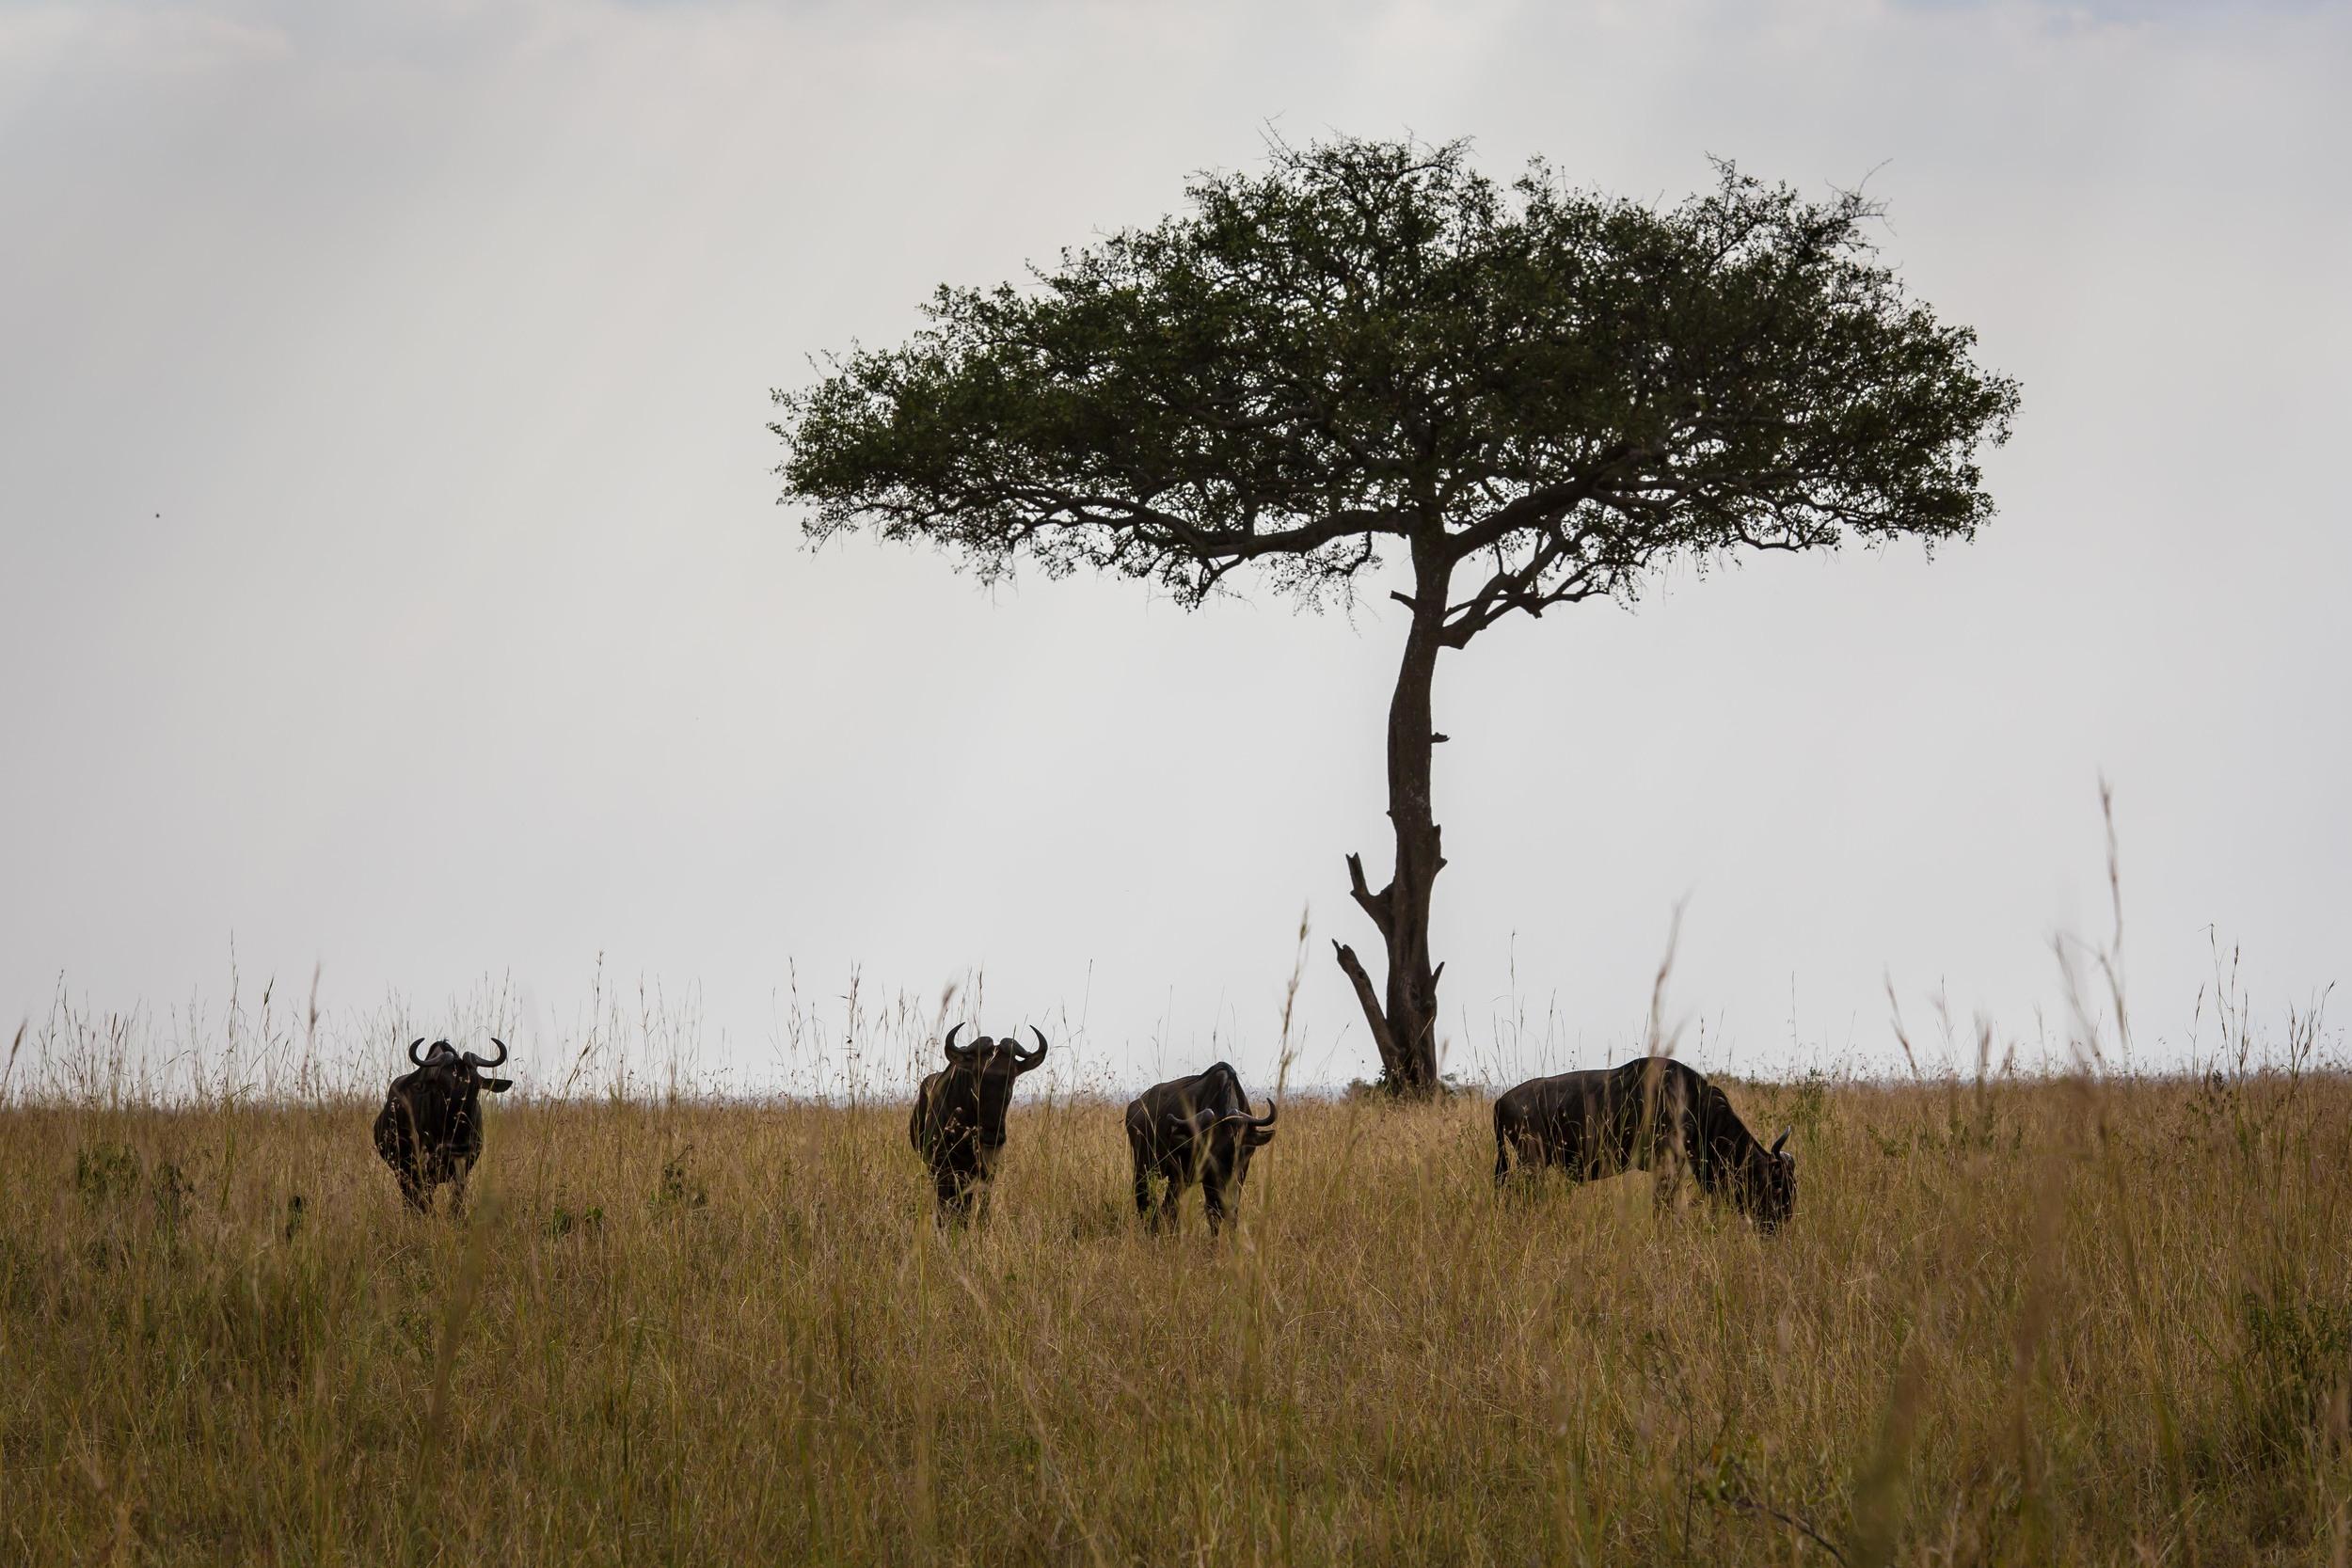 Wildebeest Grazing on the Masai Mara